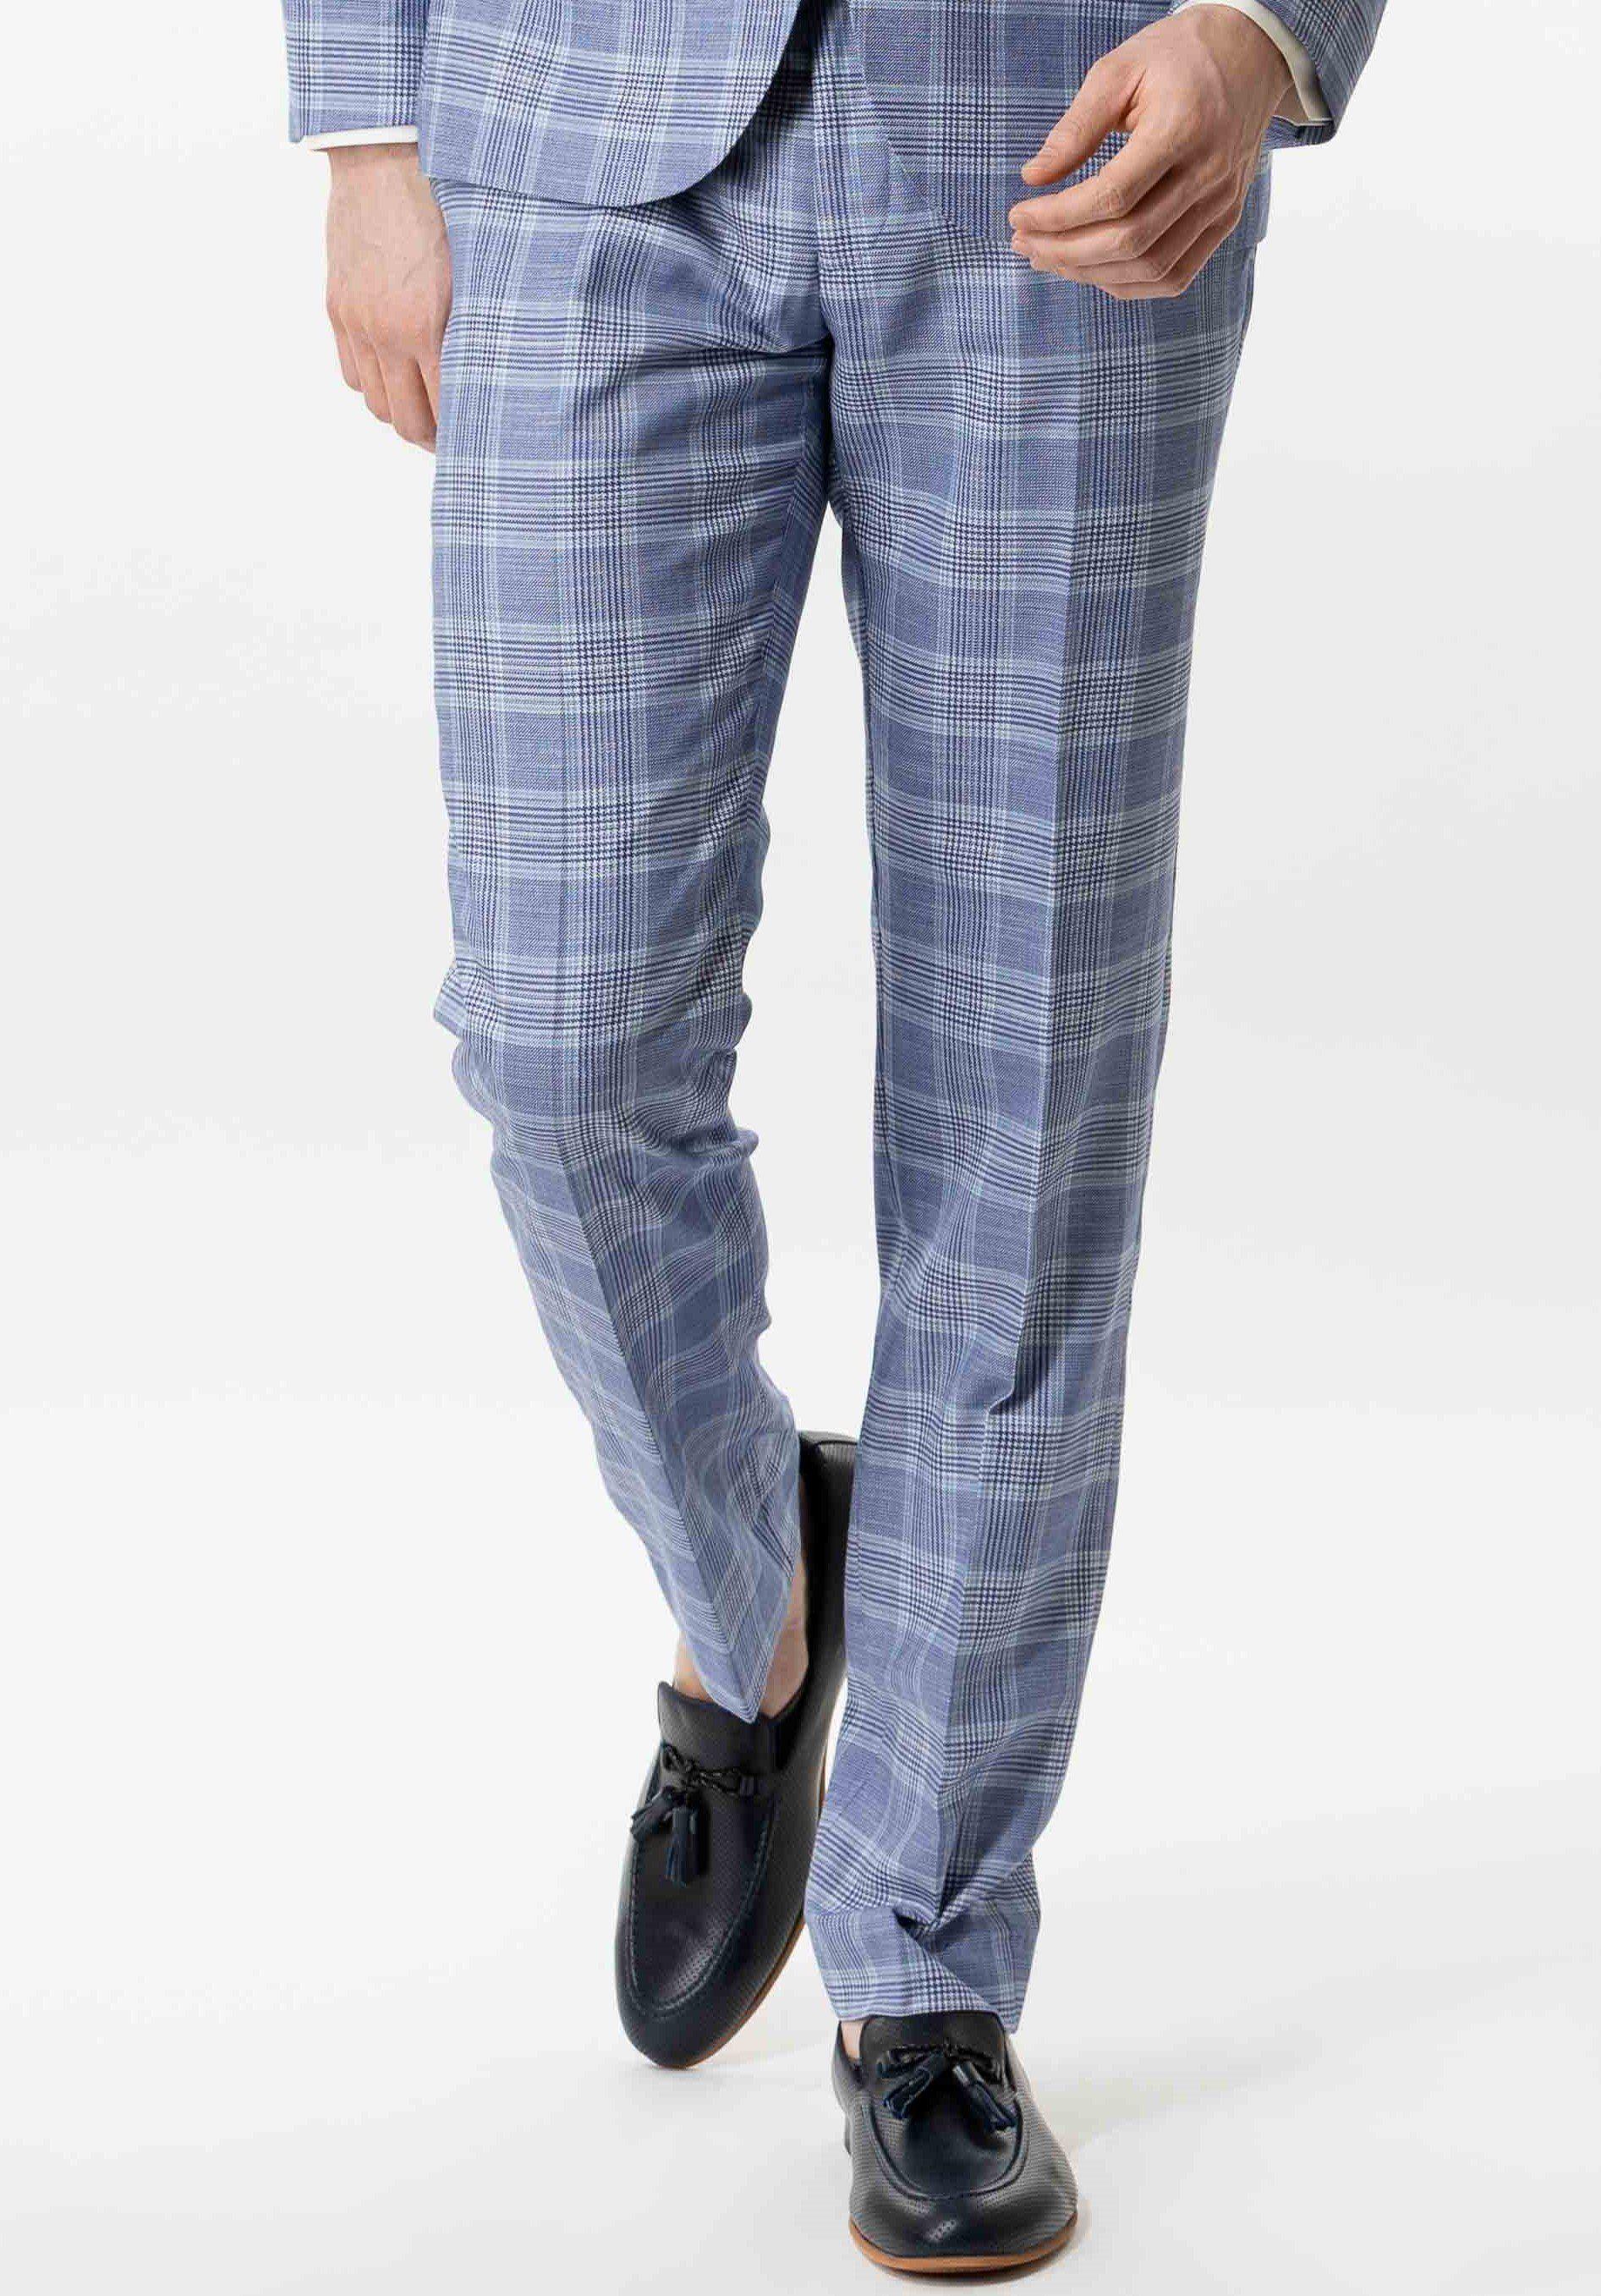 Blue And White Plaid Trouser Slim Fit | Lodevole – W40 – L36